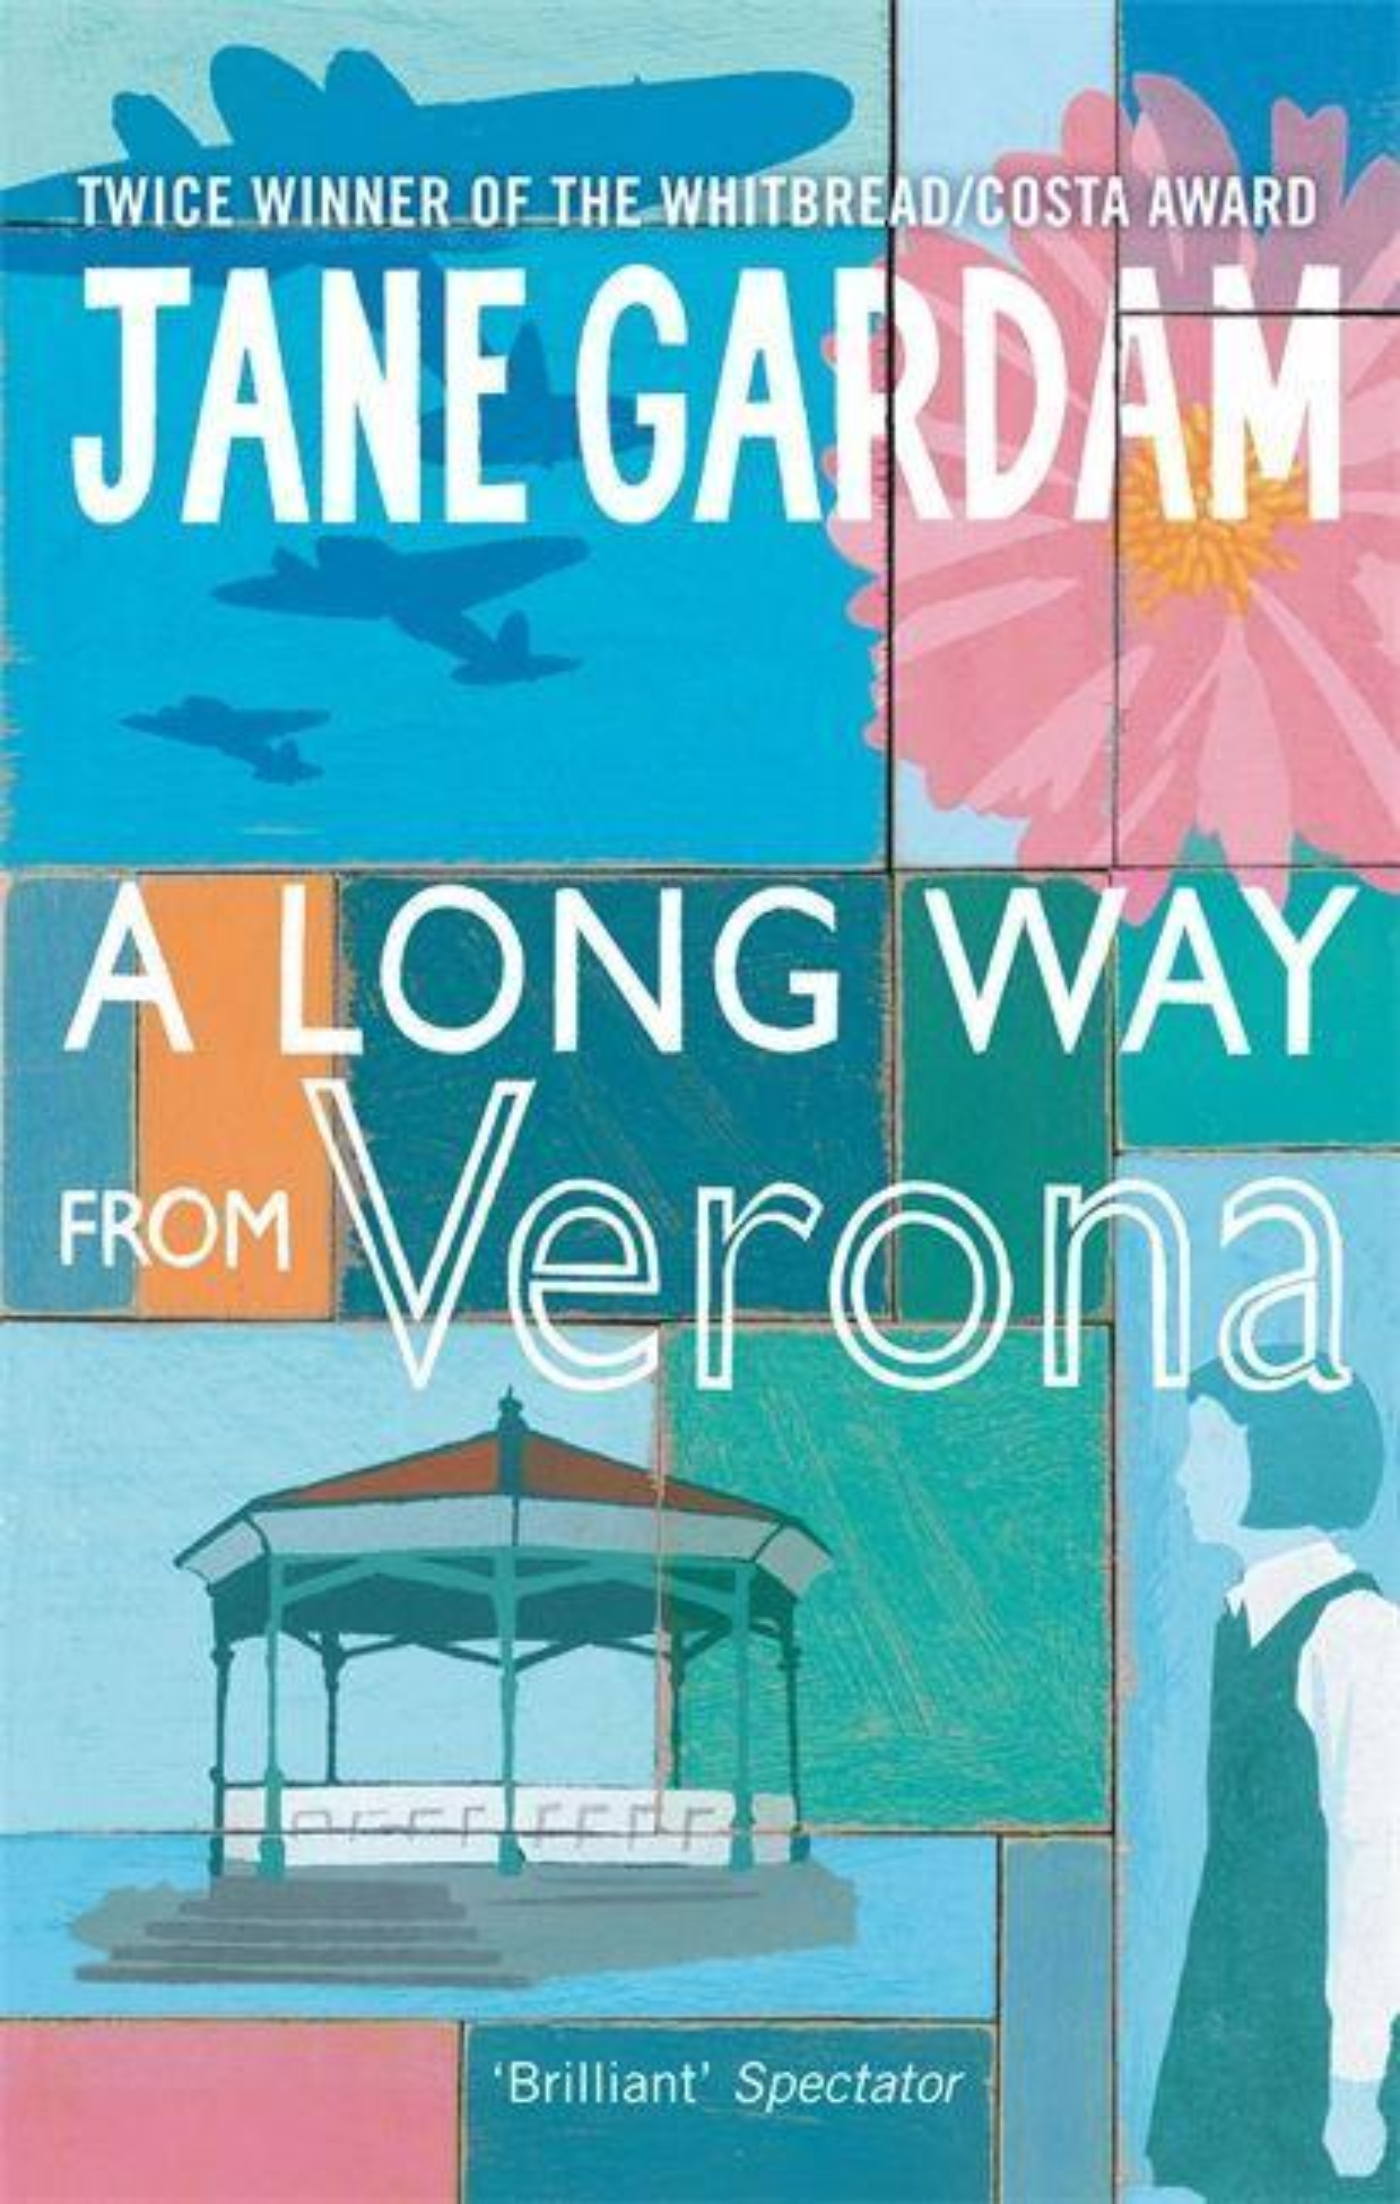 A Long Way from Verona  Jane Gardam  Taschenbuch  Englisch  2009